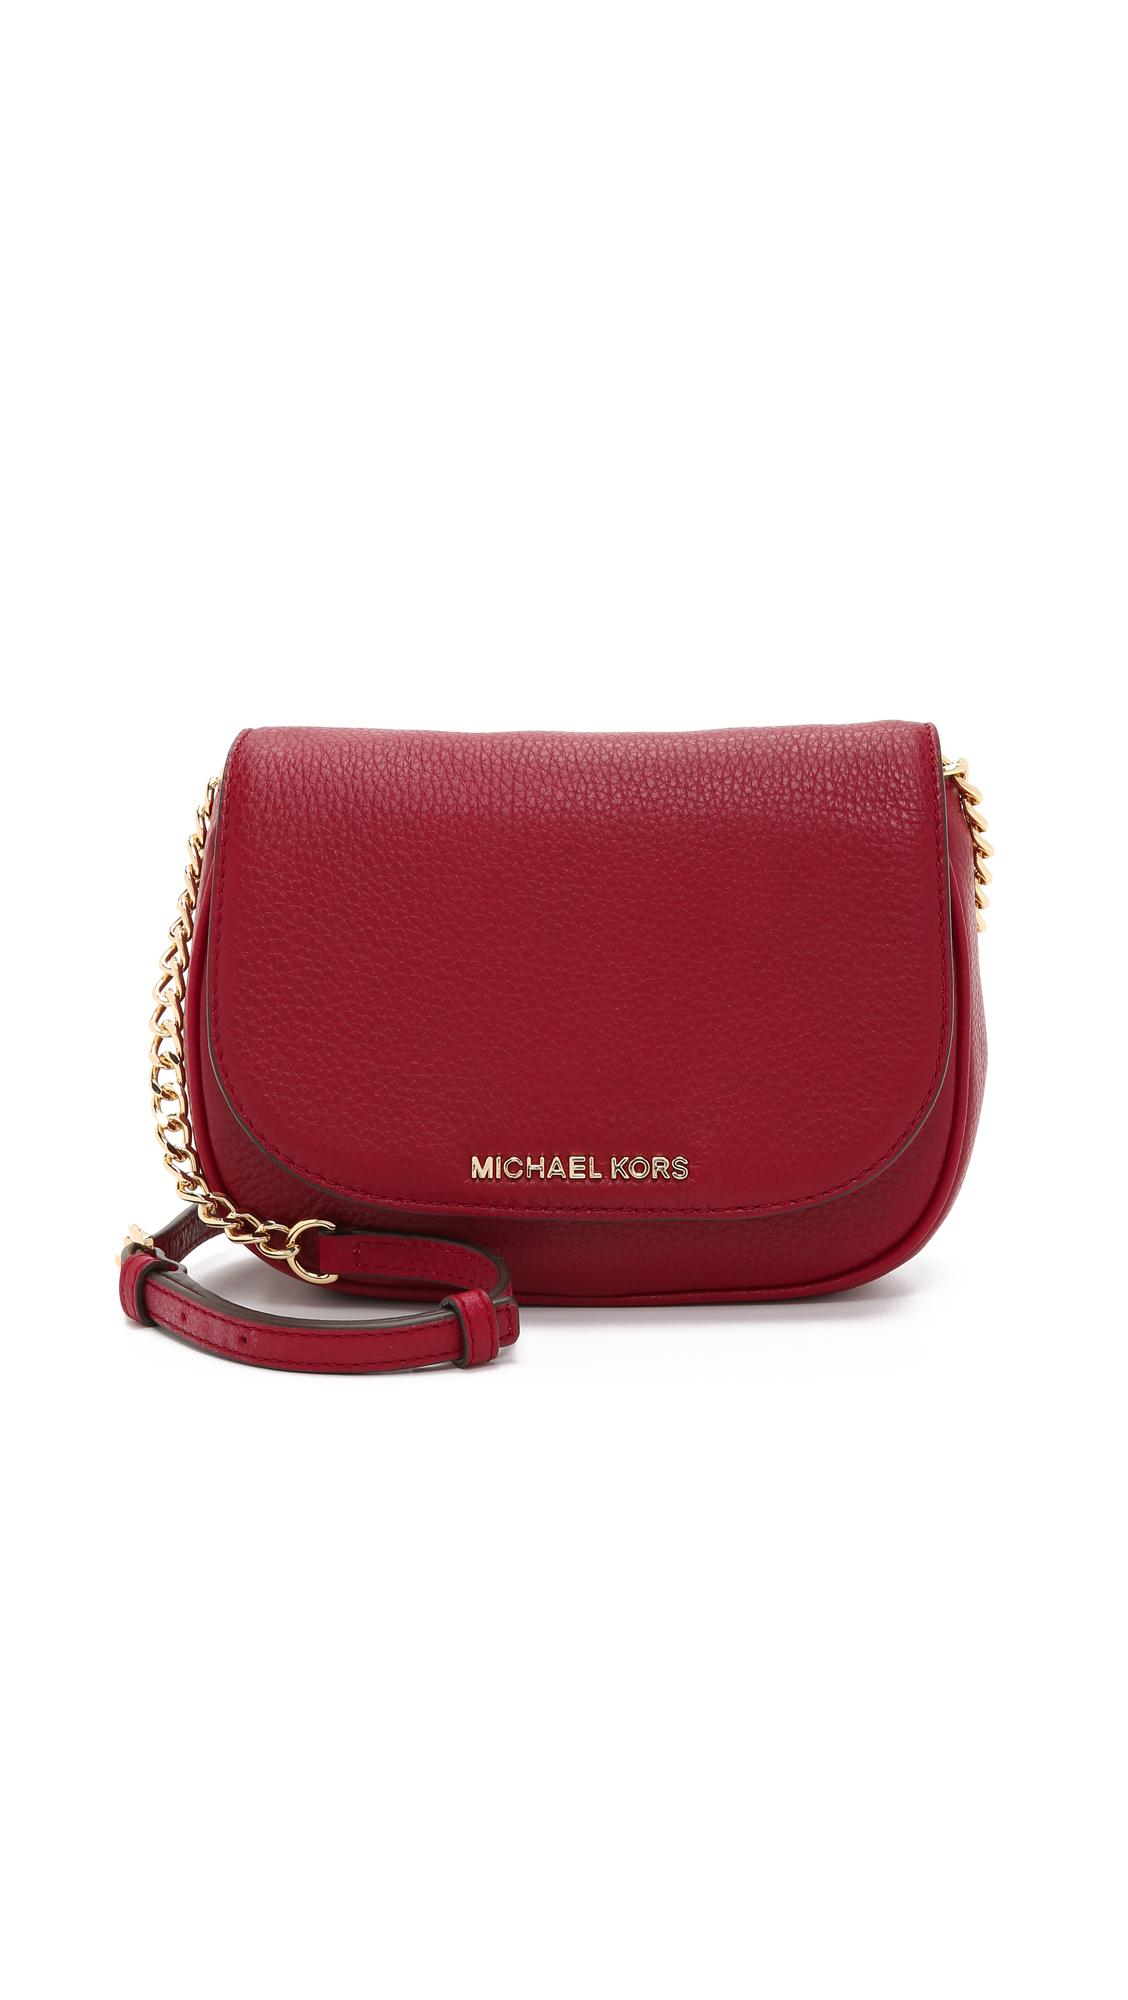 6972fe0ff83c MICHAEL Michael Kors Bedford Small Cross Body Bag - Cherry in Red - Lyst